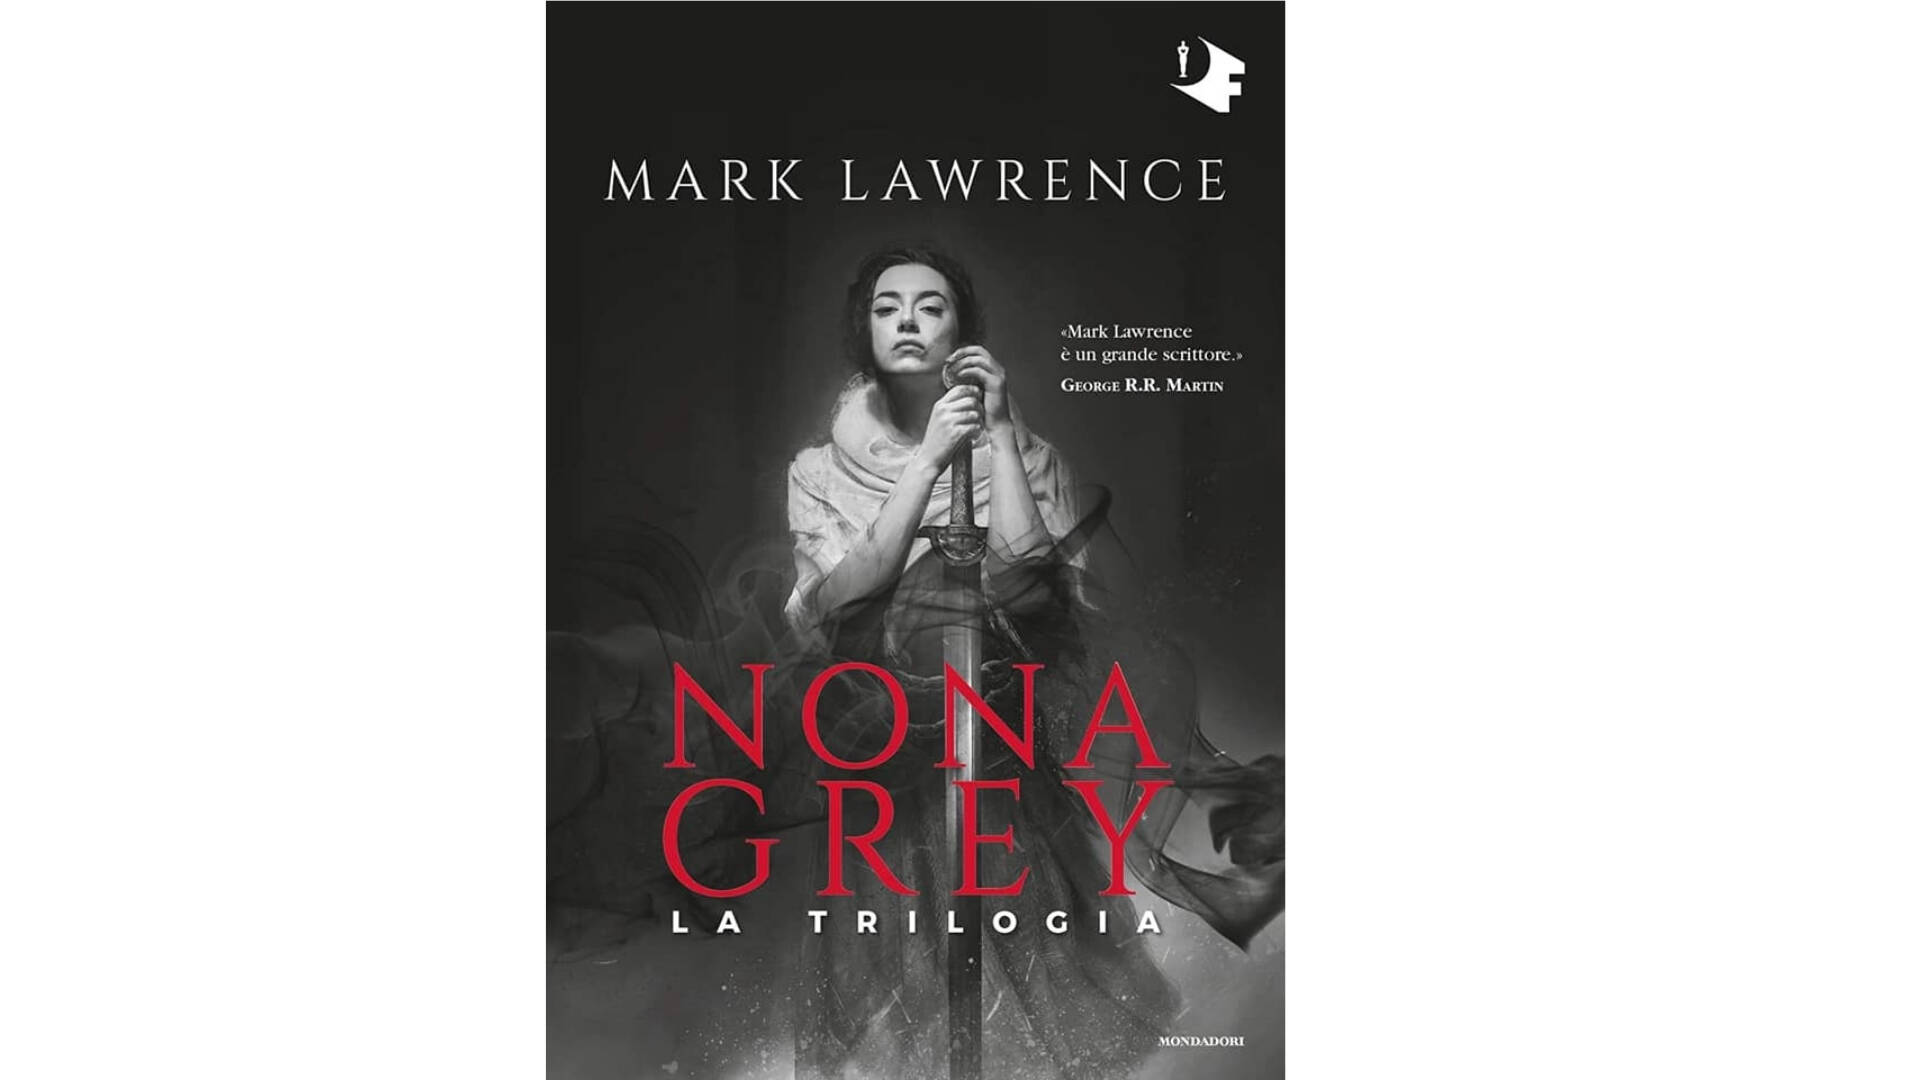 nona grey 4